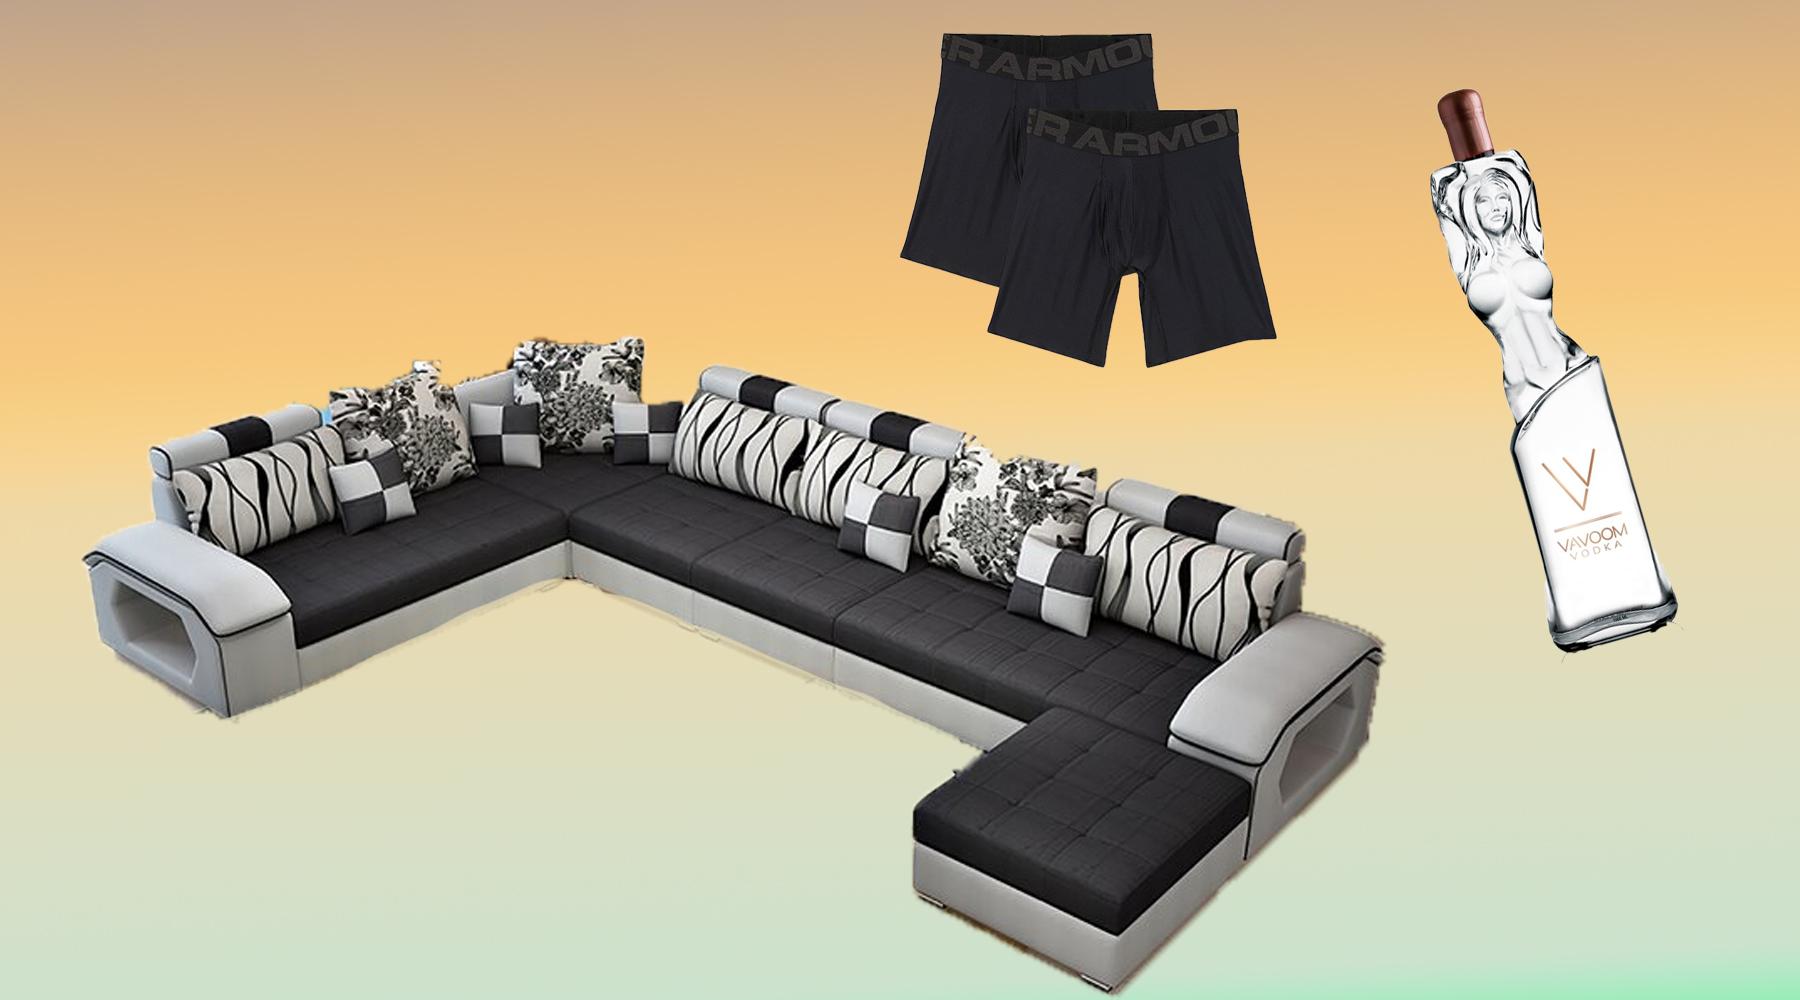 gamer-couch.jpg